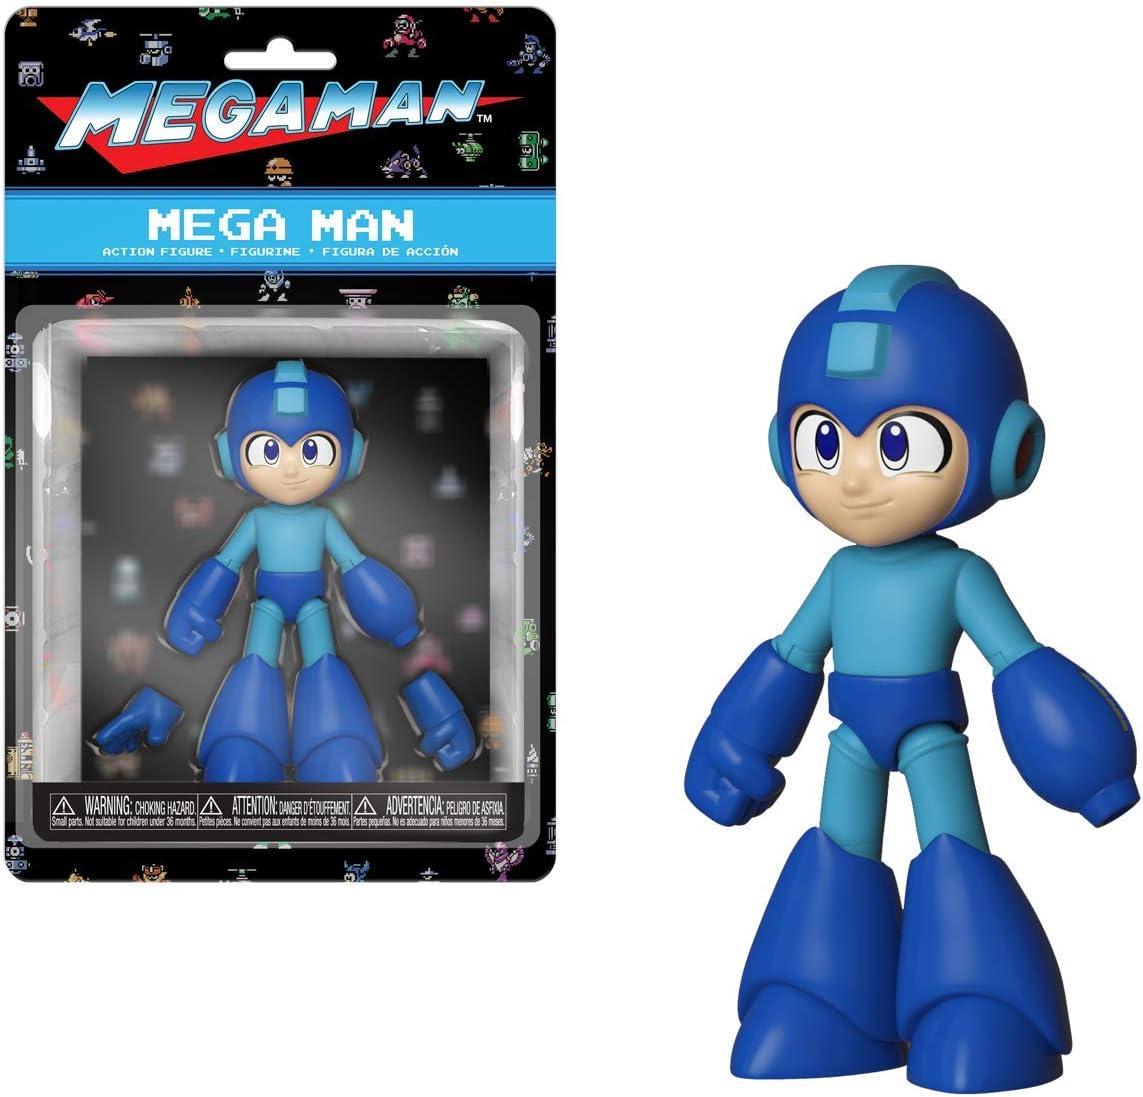 Mega Man Mega Man Funko Action Figure